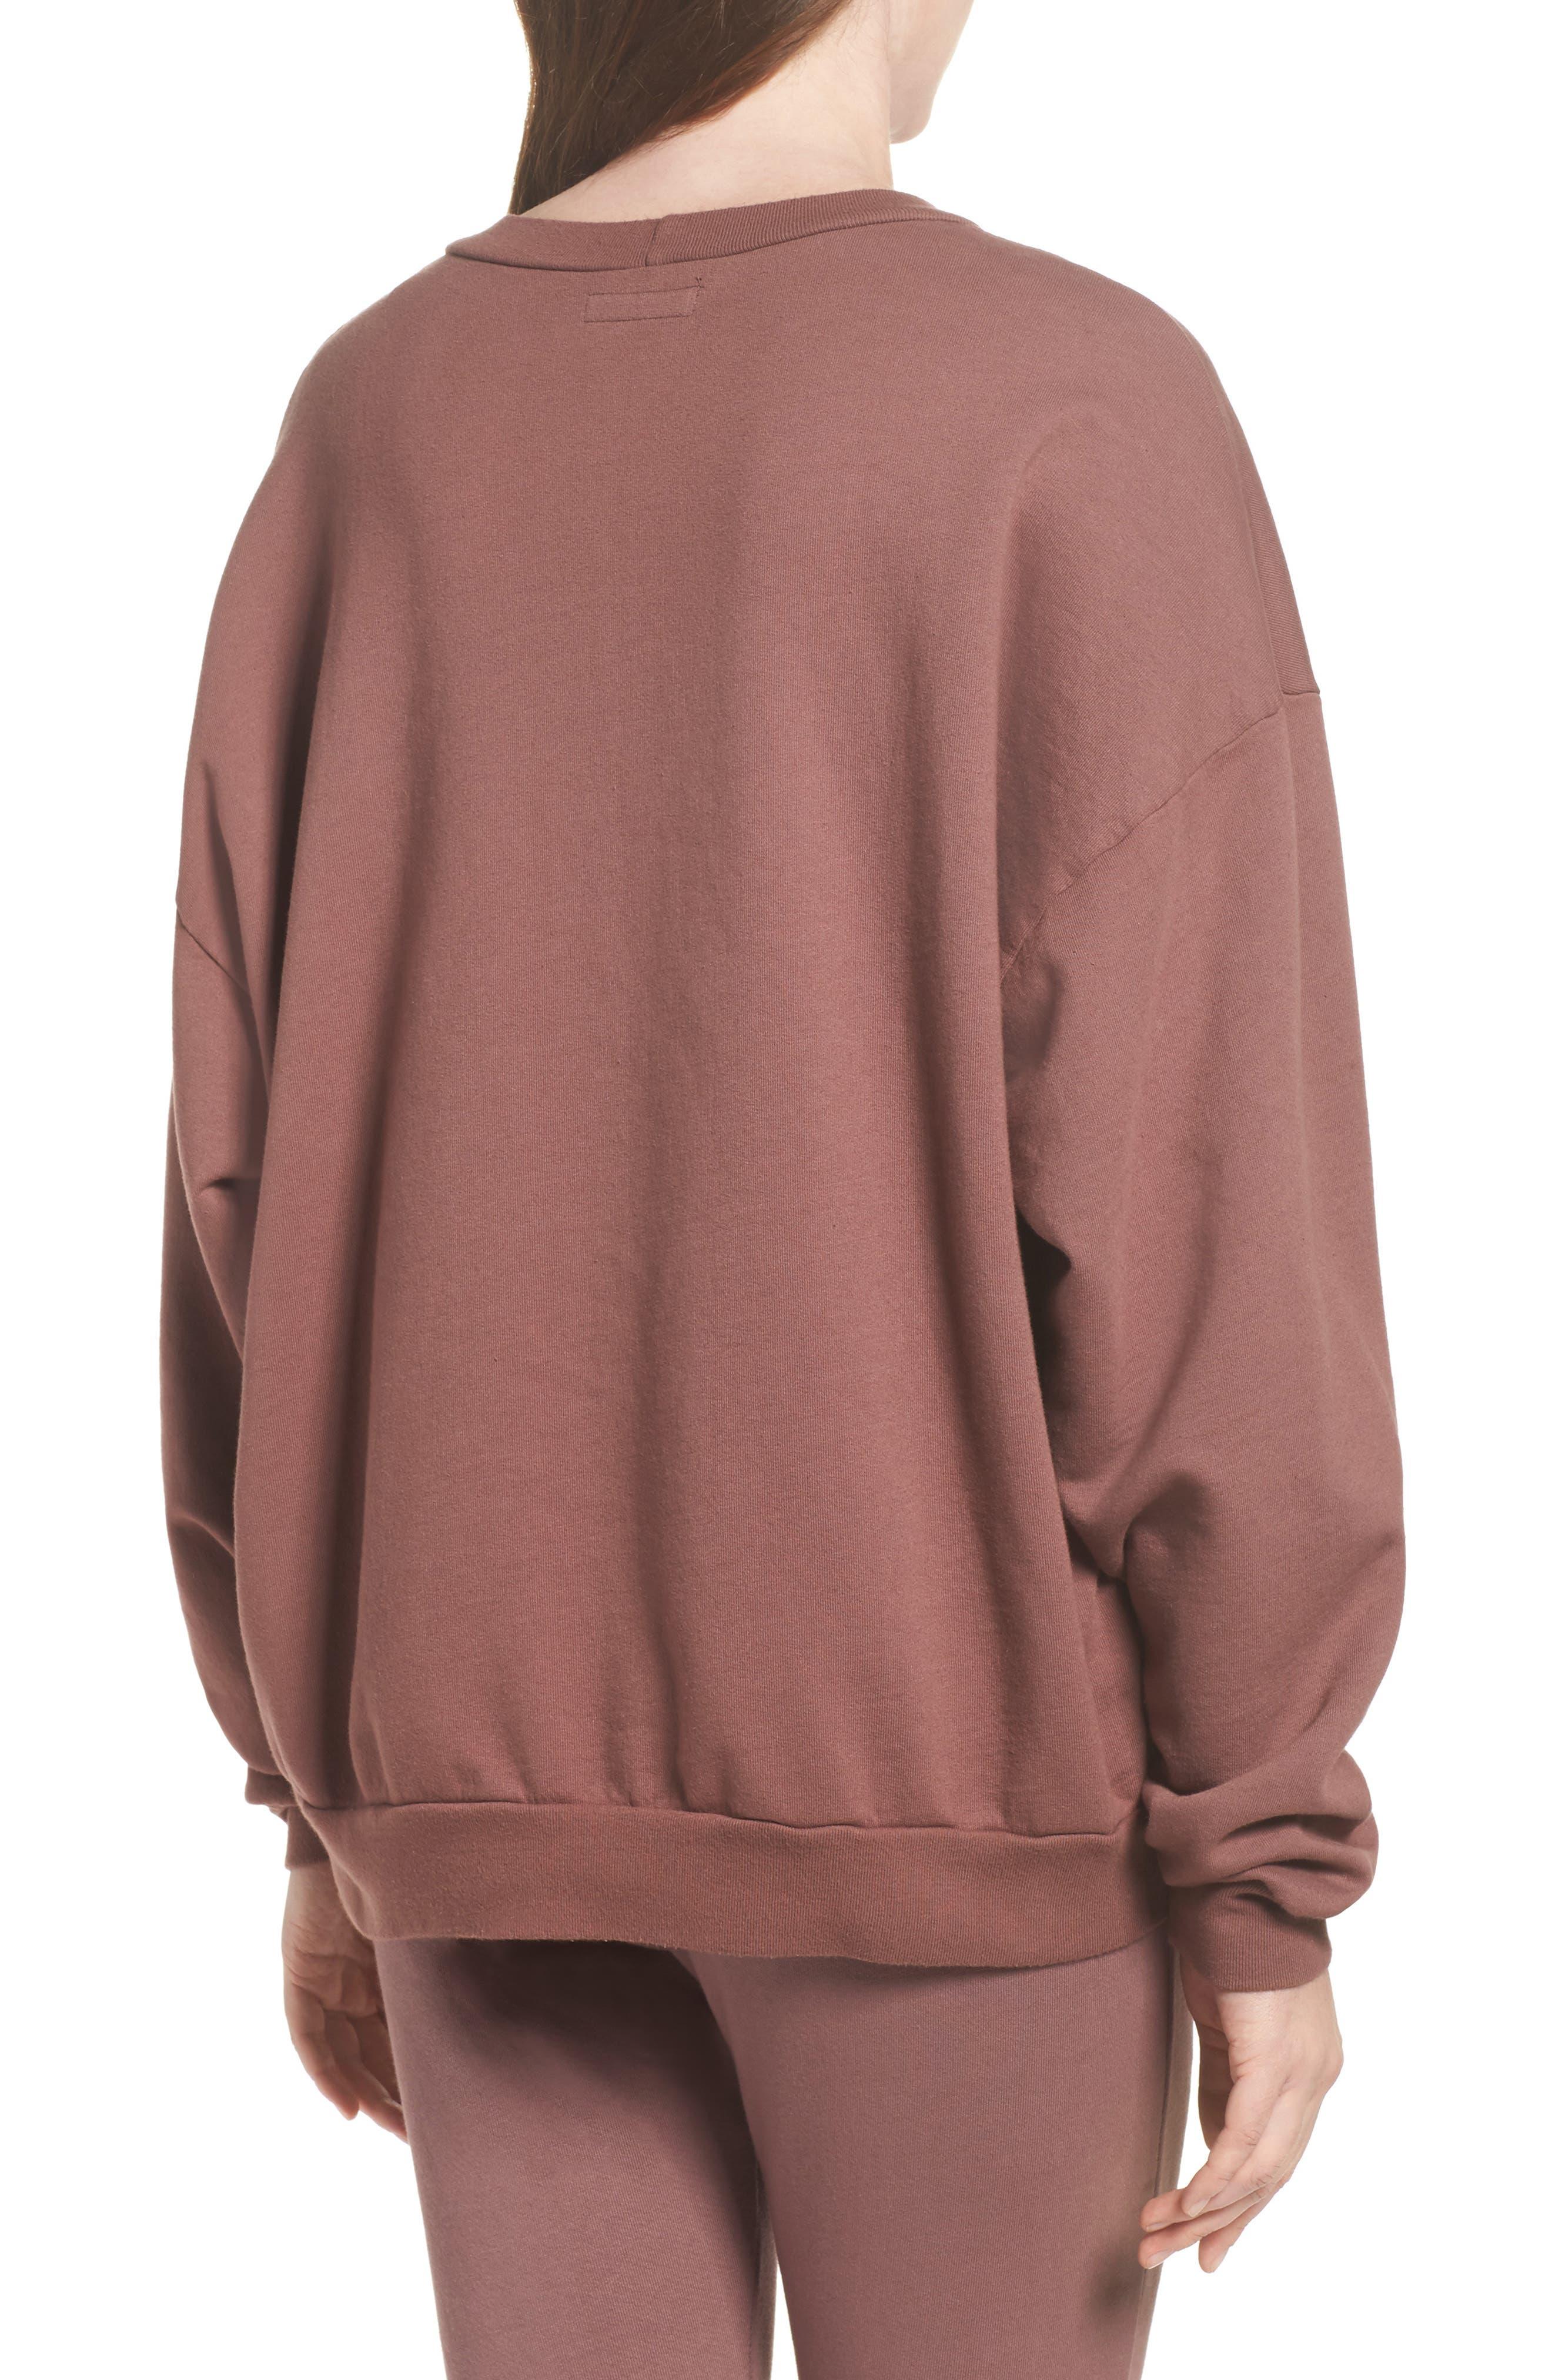 Ellstan Oversize Boyfriend Sweatshirt,                             Alternate thumbnail 4, color,